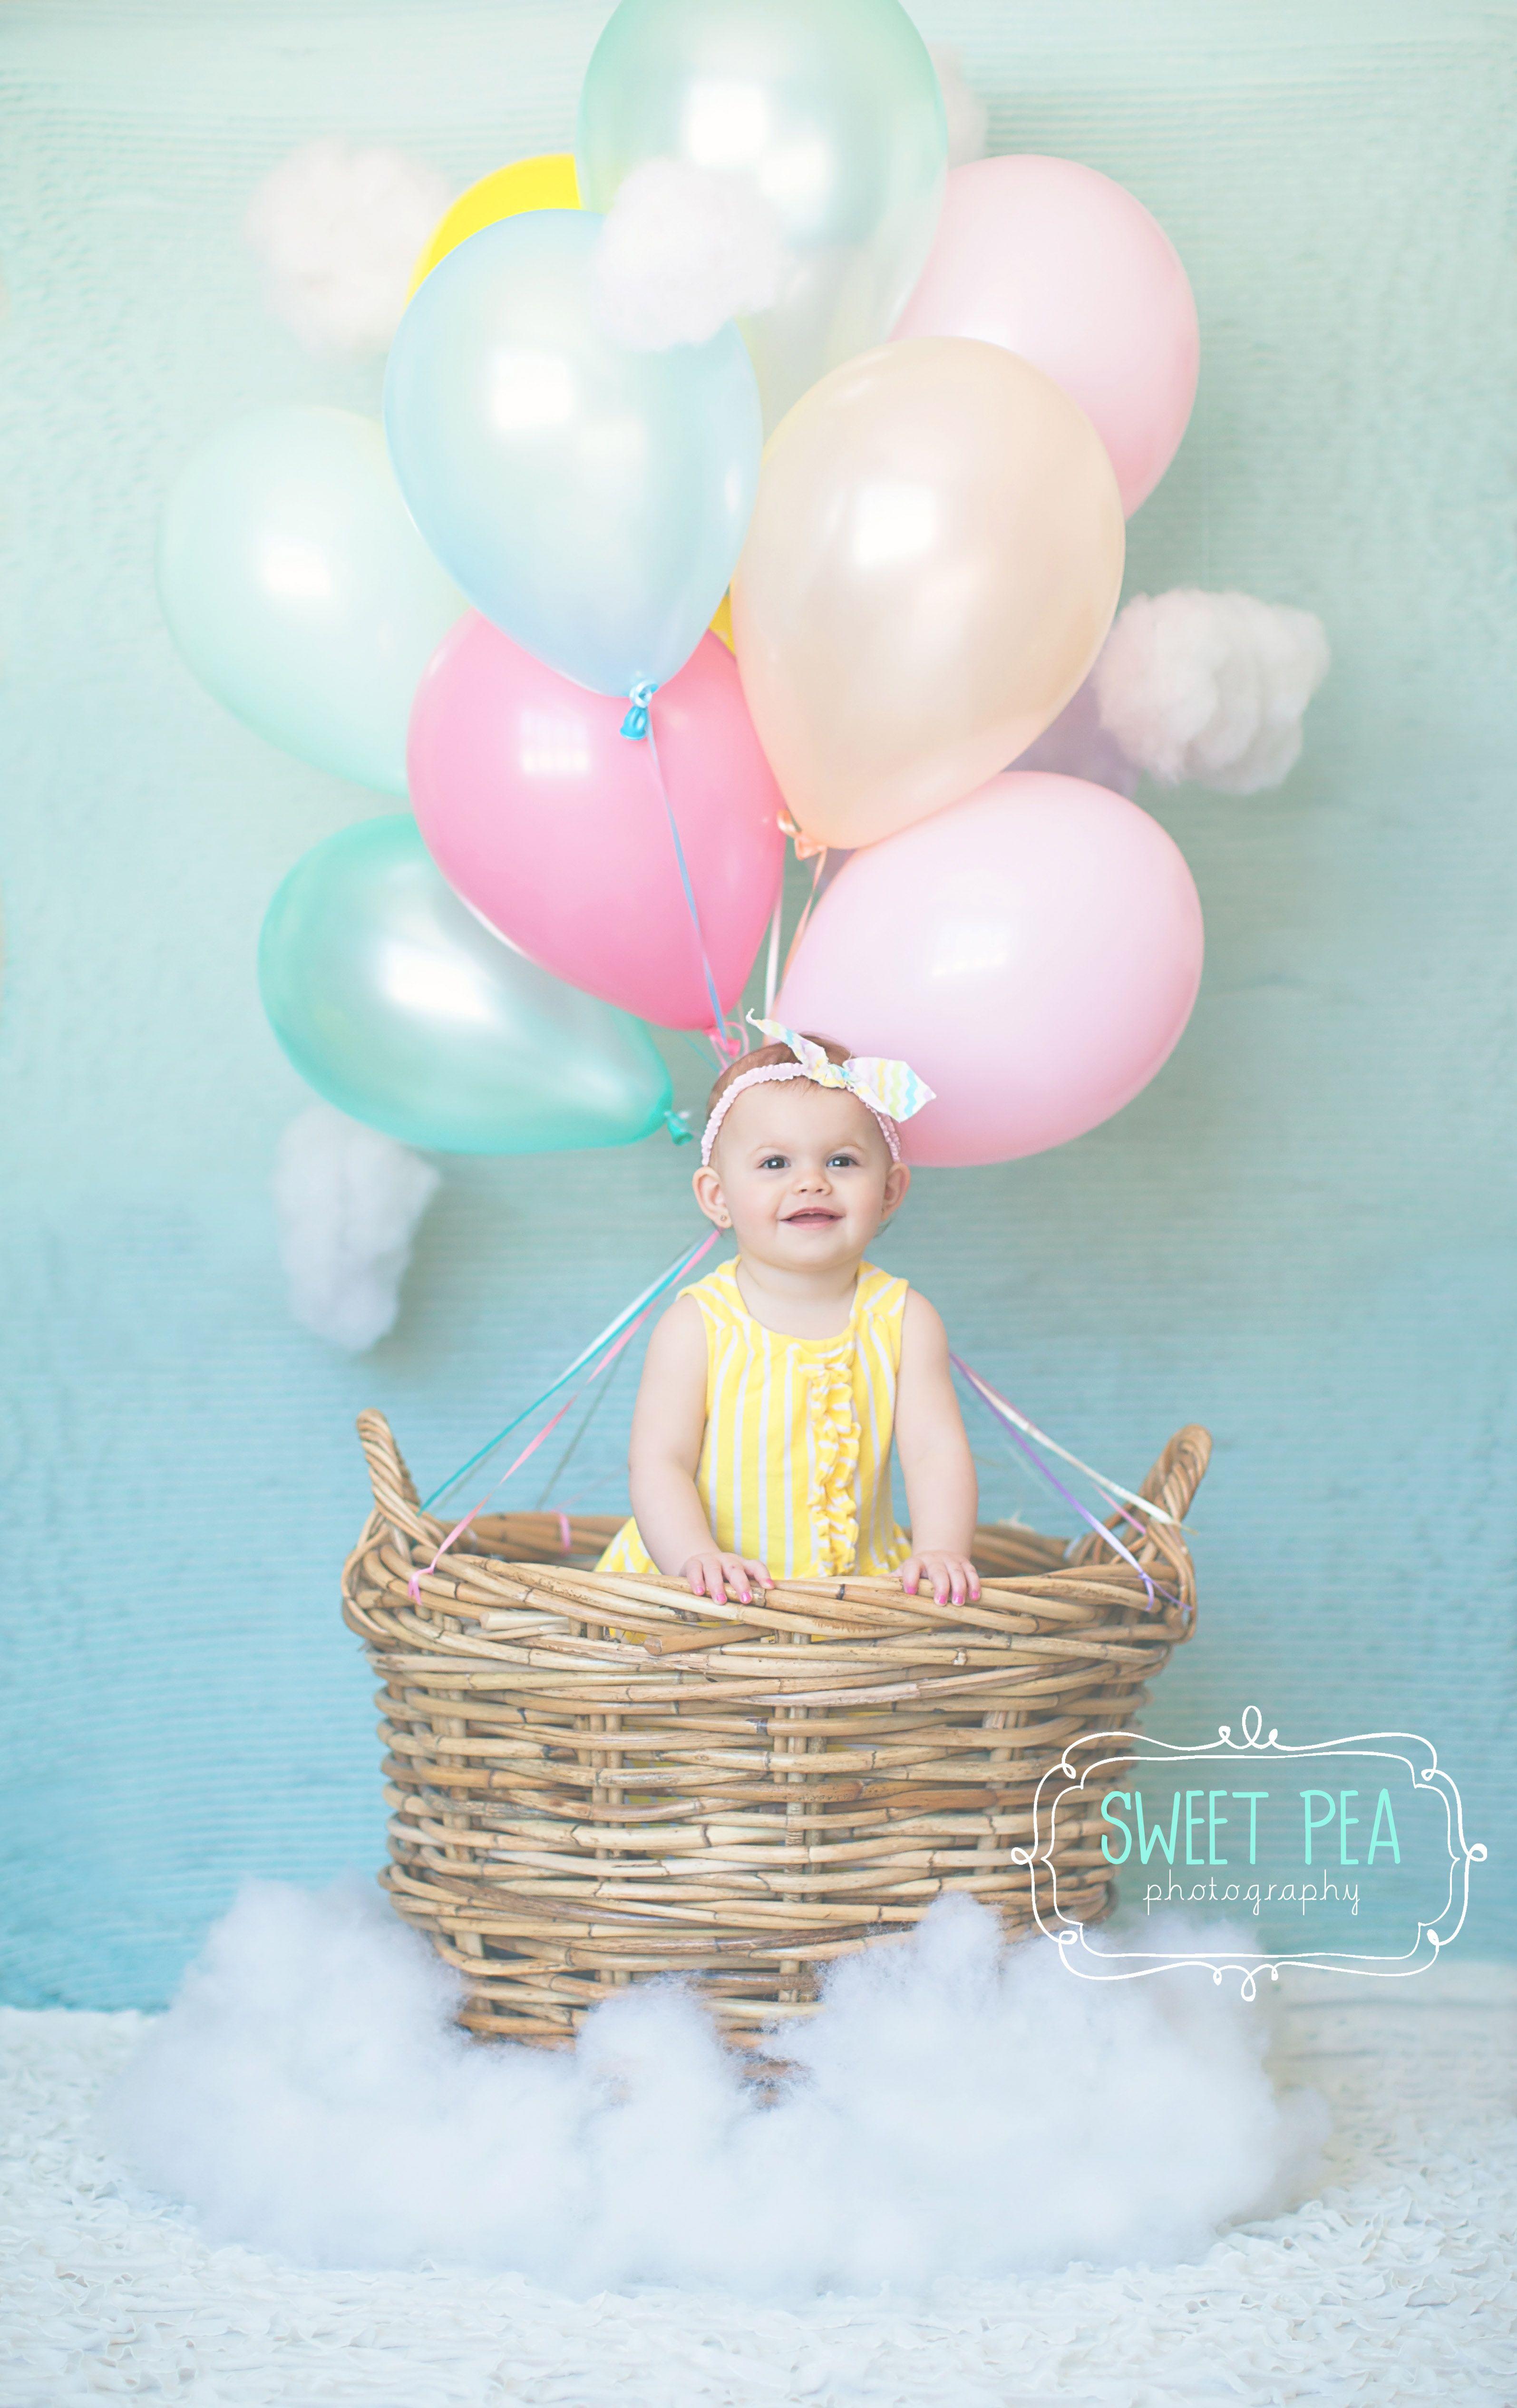 Hot Air Balloon, 1st Birthday, Sweet Pea Photography